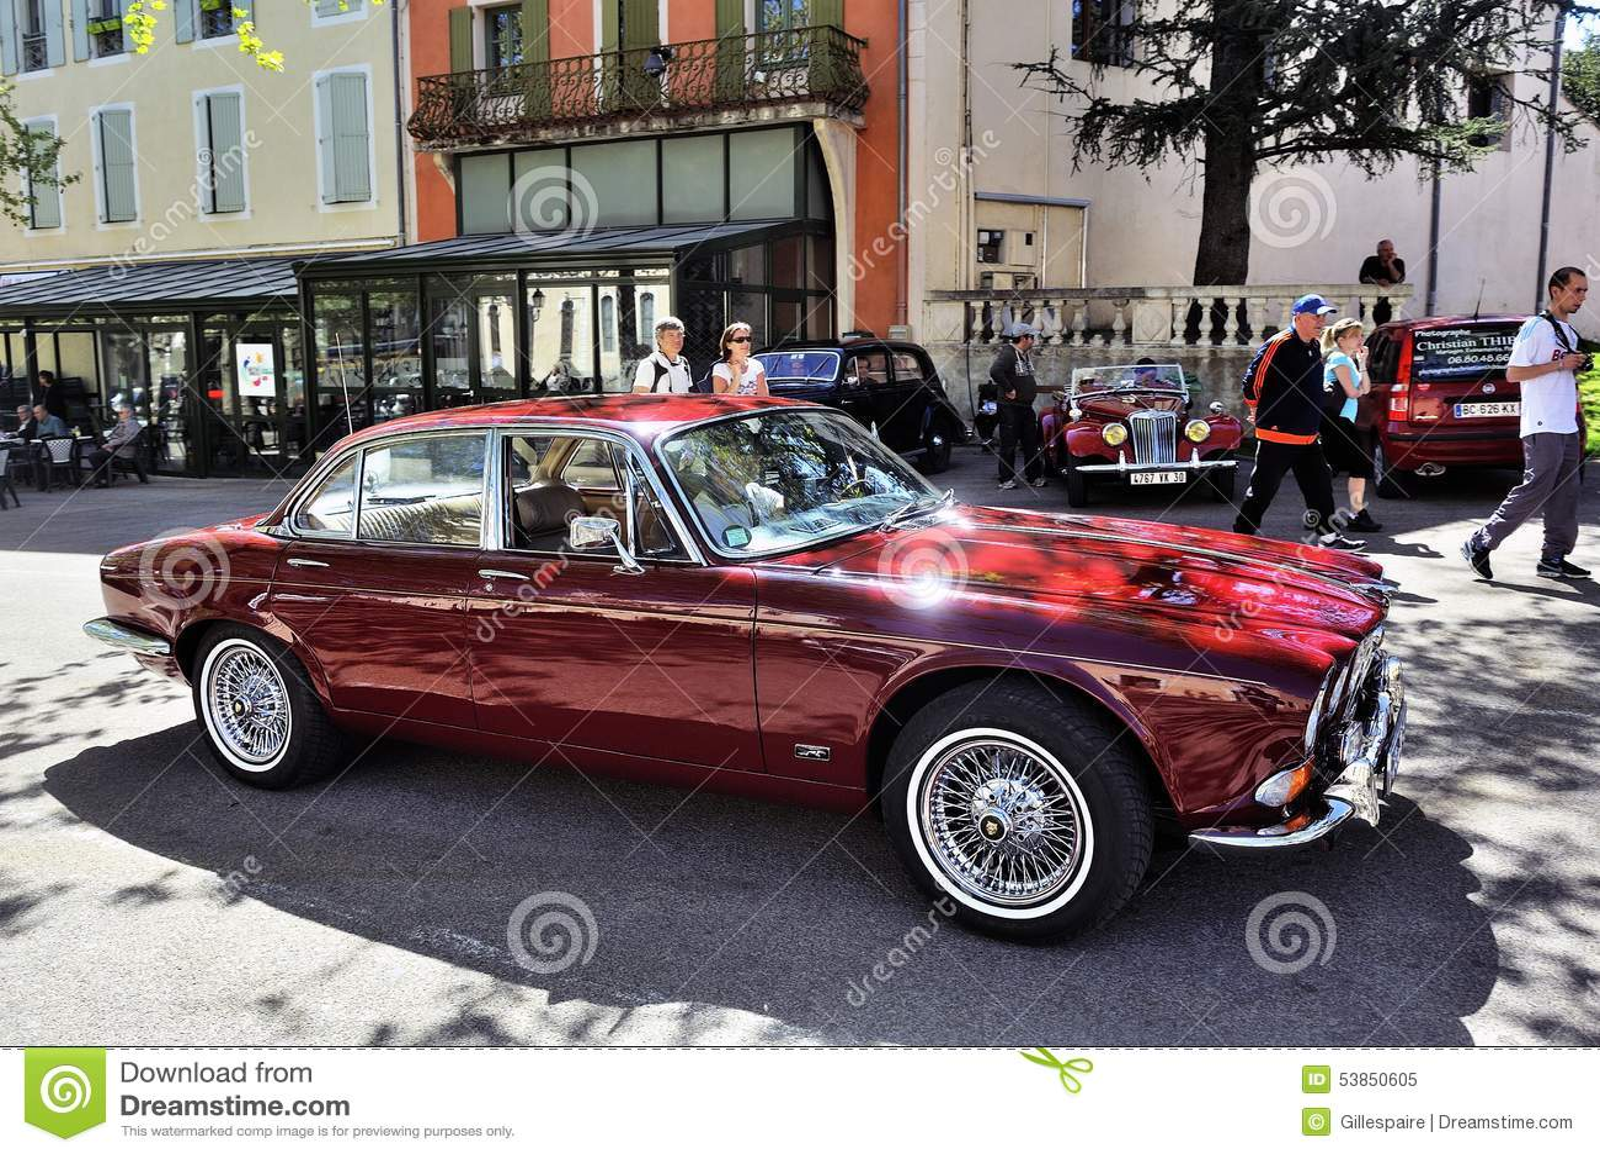 jaguar xj editorial image image of beautiful cars. Black Bedroom Furniture Sets. Home Design Ideas